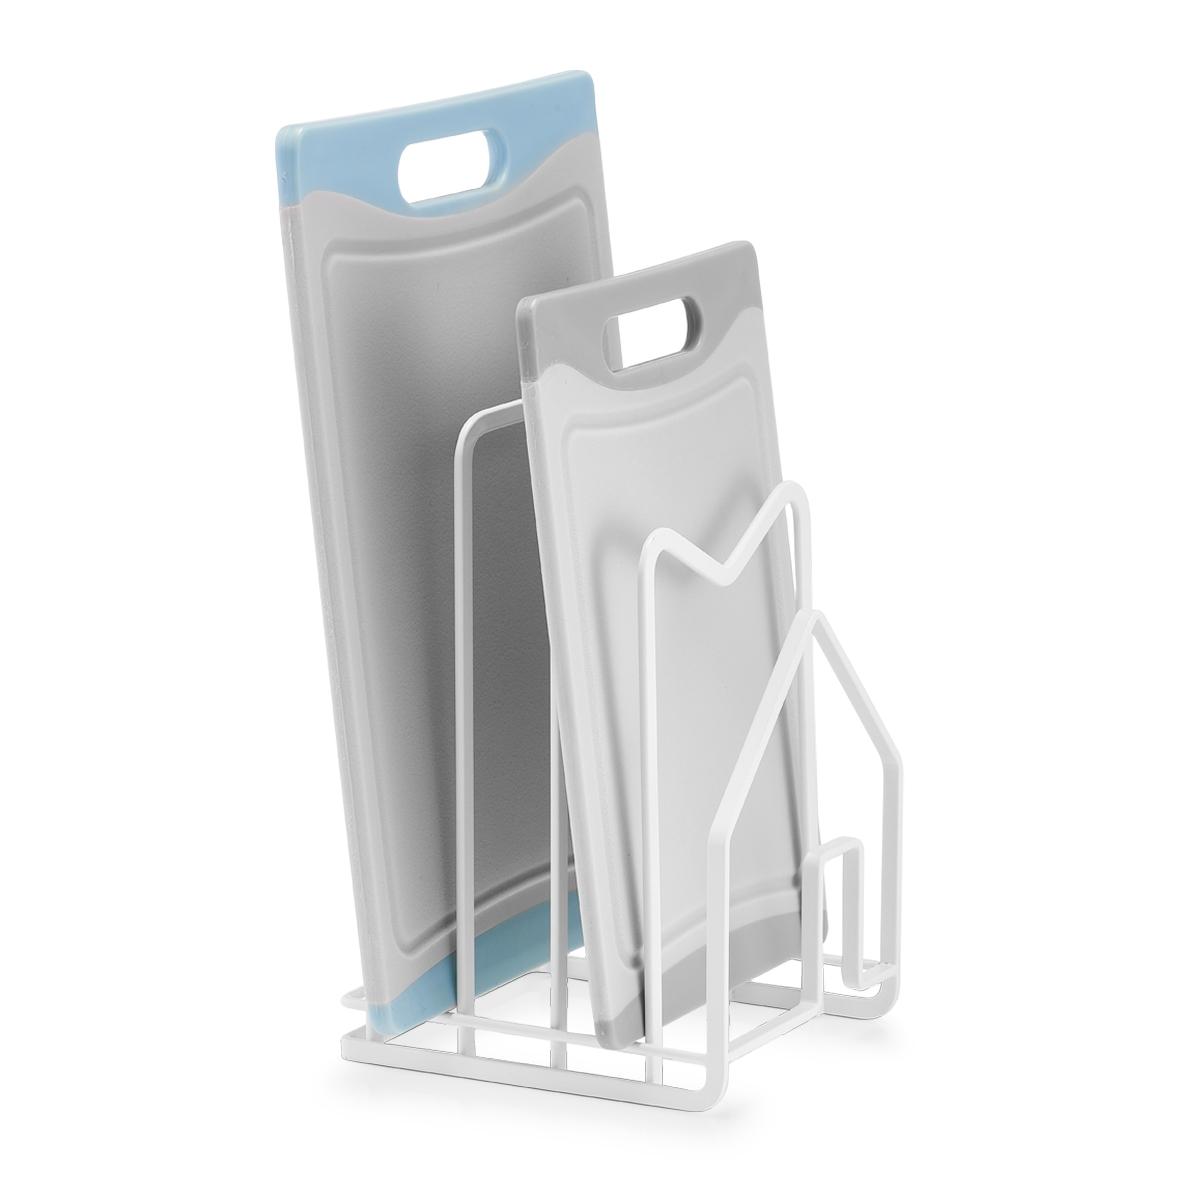 Suport metalic pentru vesela si accesorii, Drain Alb, L14,5xl12xH21,5 cm imagine 2021